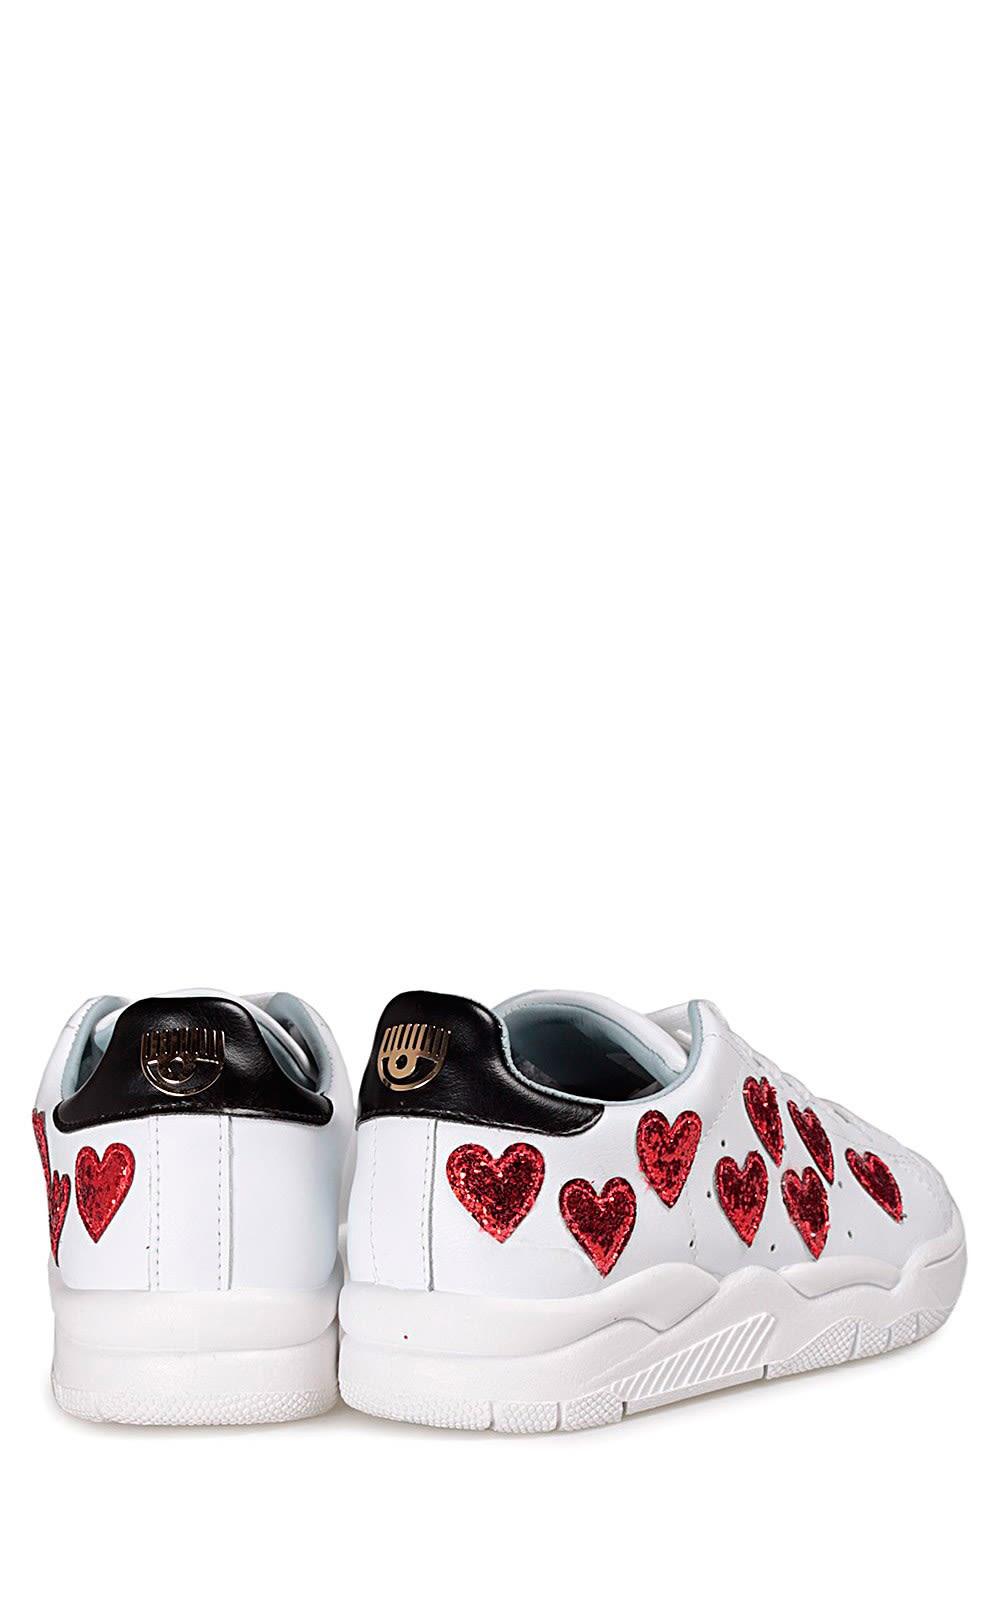 Roger Heart leather sneakers Chiara Ferragni pxtWT